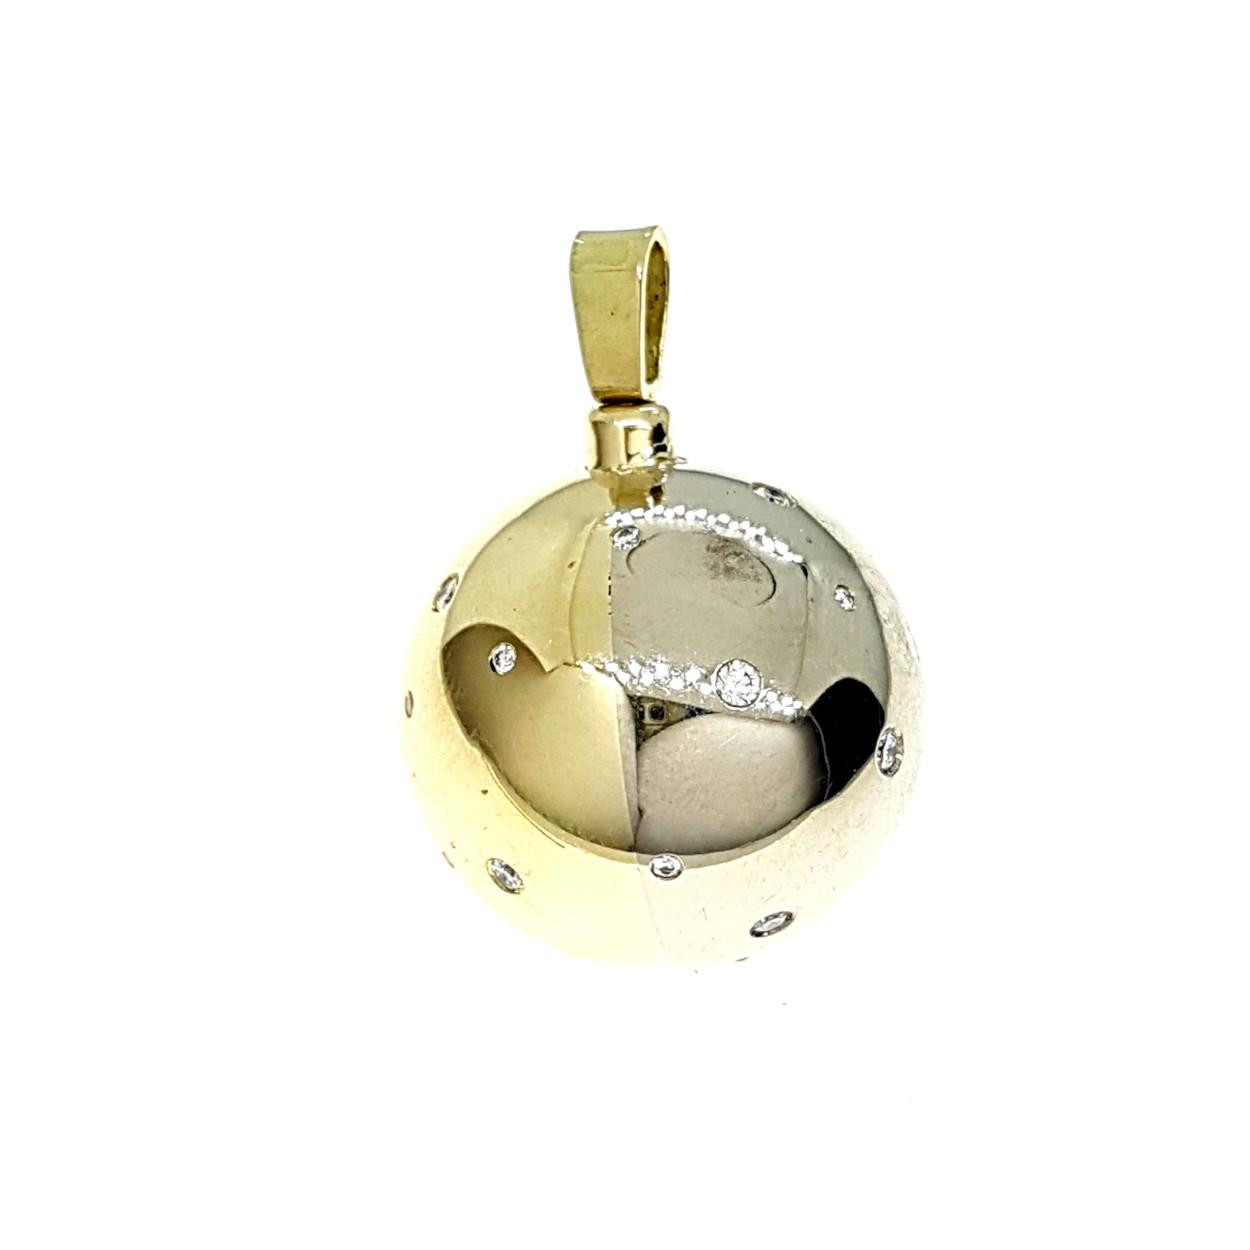 Hanger bicolor en diamant - sieraad in opdracht - Edelsmederij puur & pracht Helvoirt